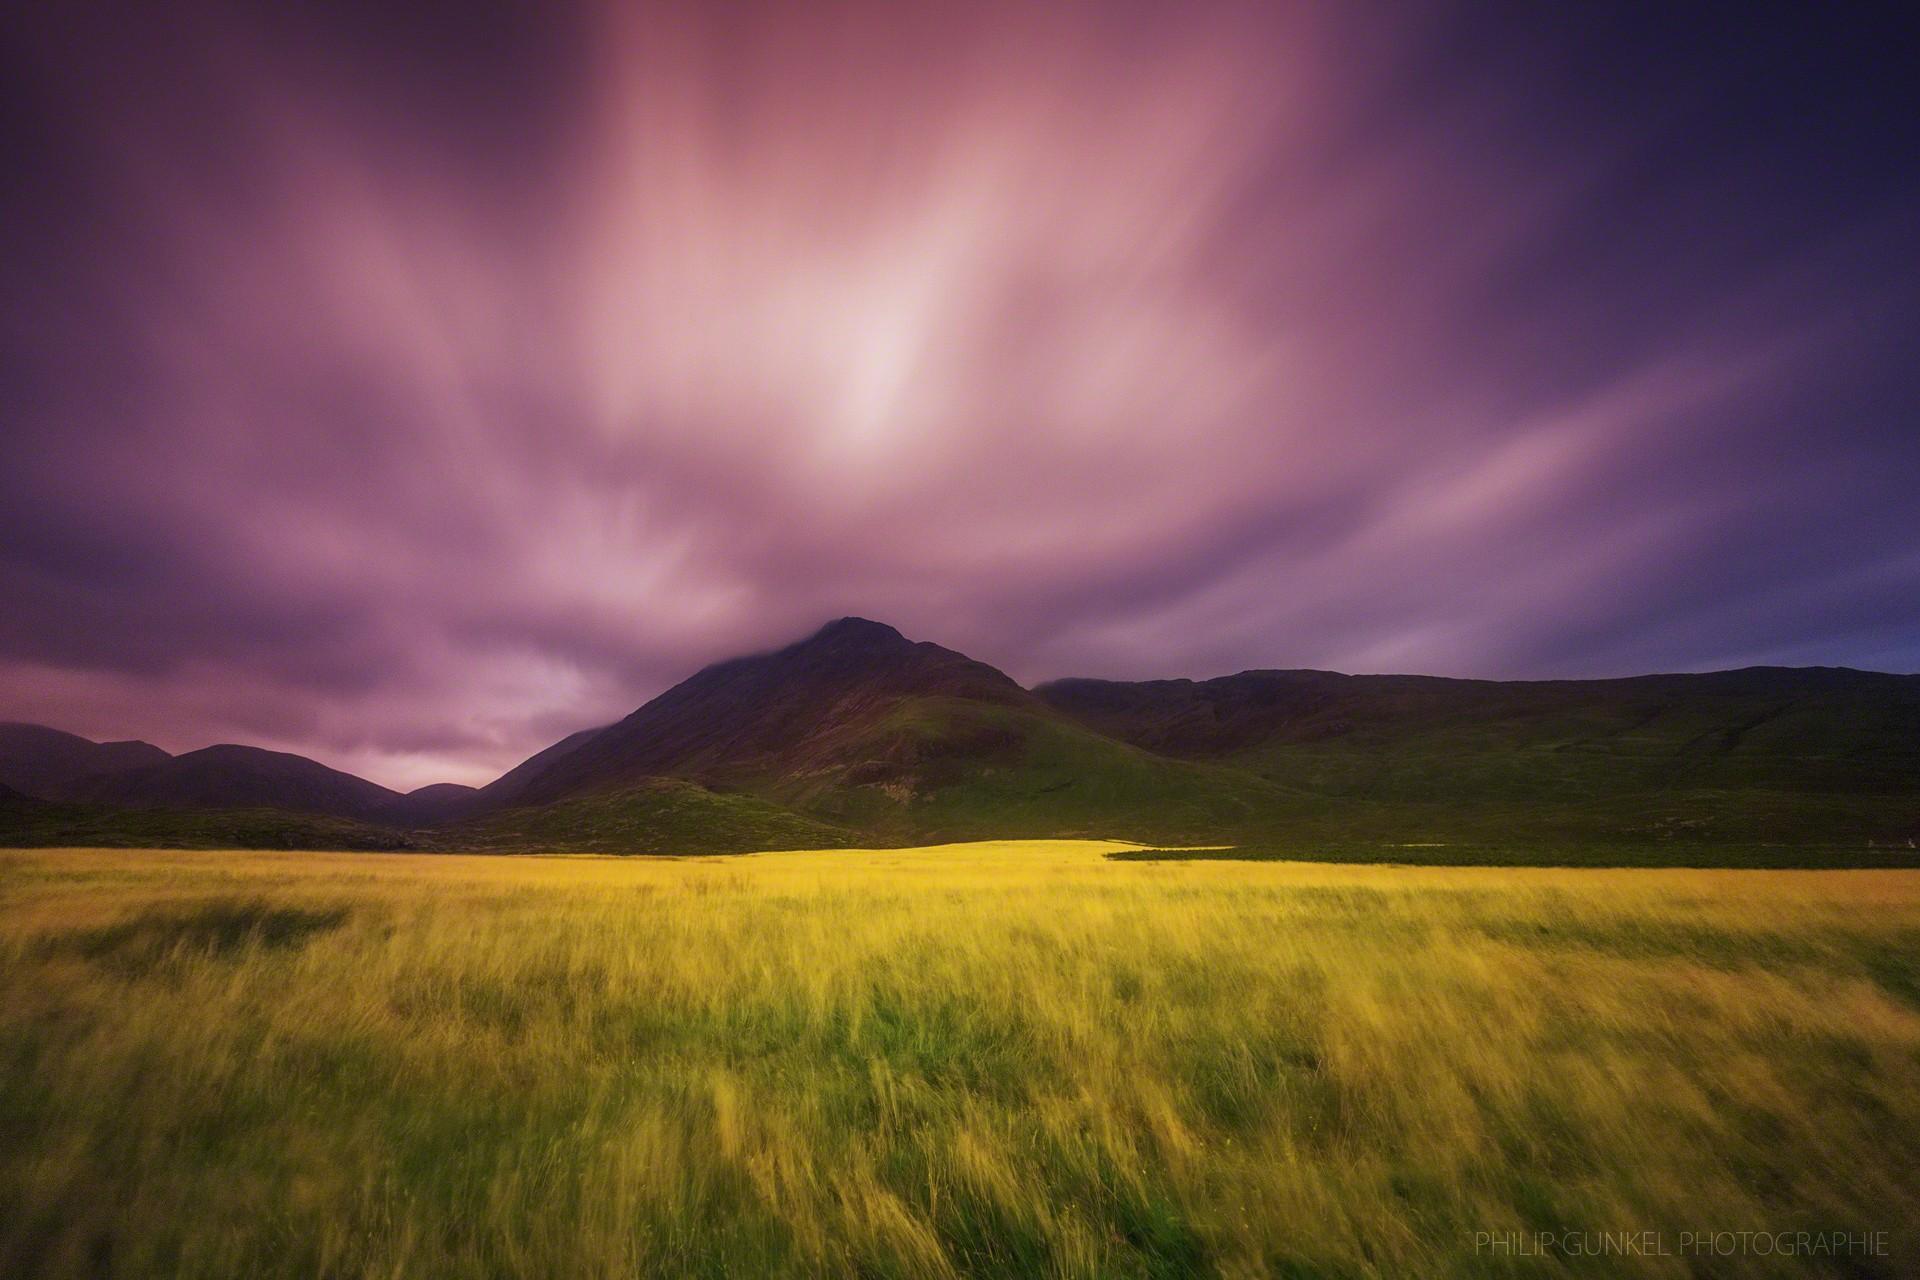 scotland_philip_gunkel_photographie_www.philipgunkel.de39